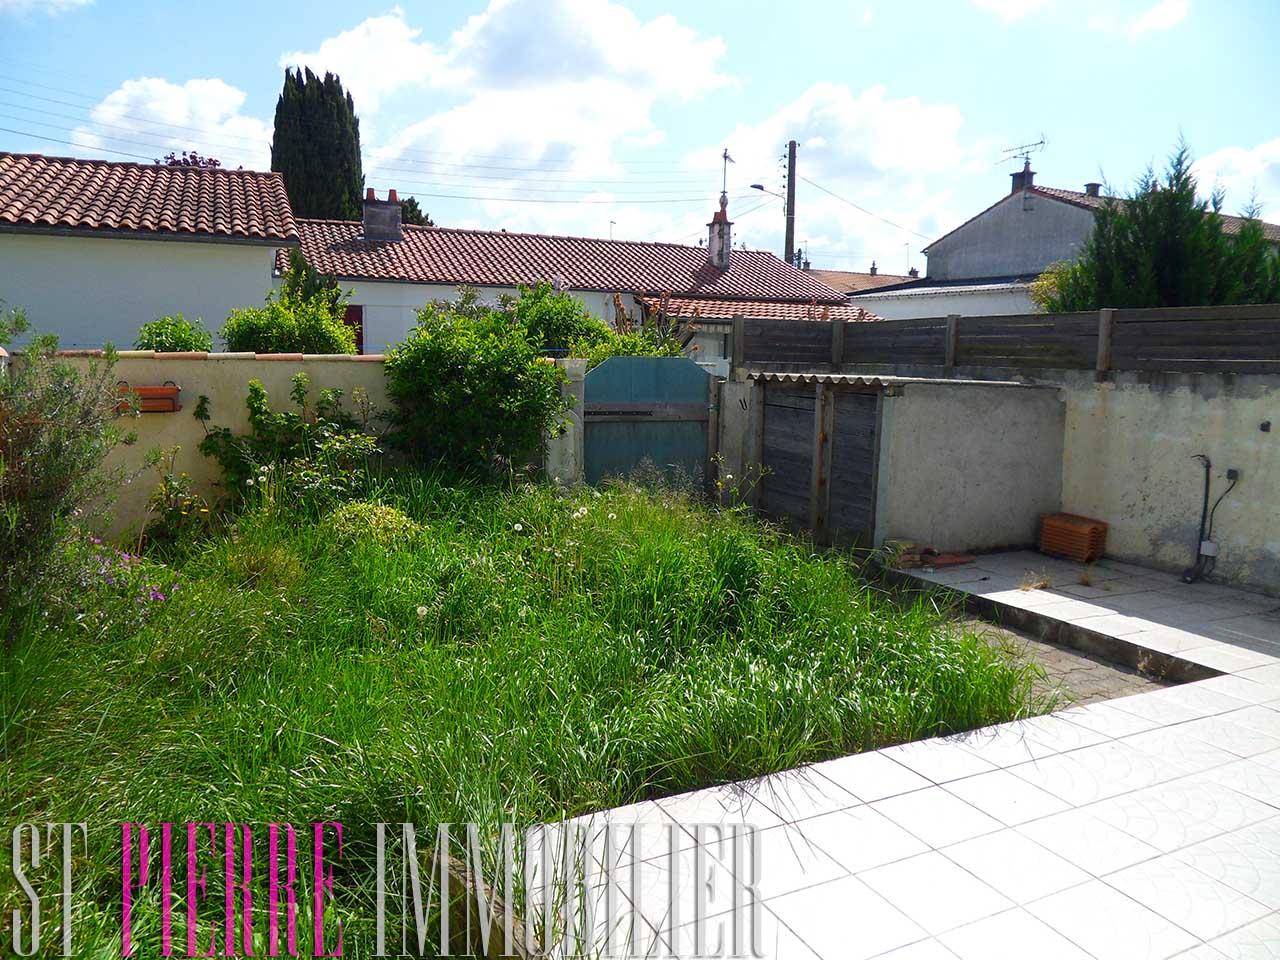 En vente maison niort 4 chambres jardin 113 000 for Jardin immobilier